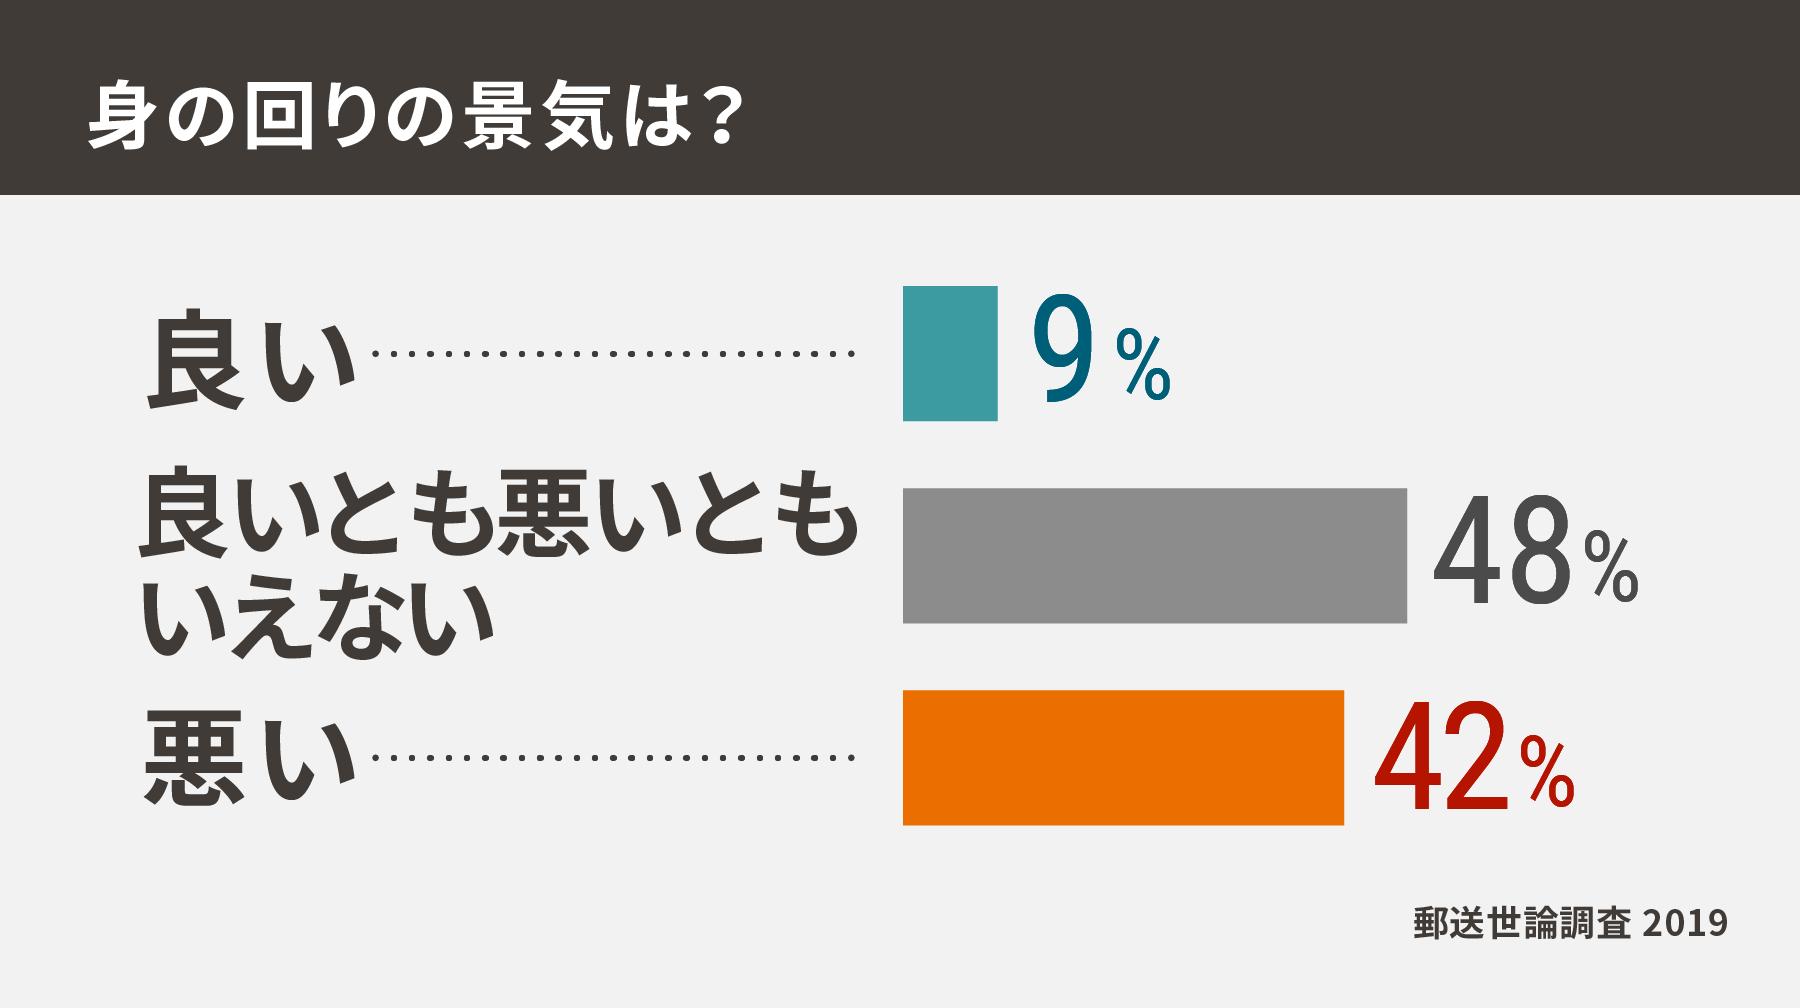 数字で見るリアル世論 郵送調査2019:日本経済新聞